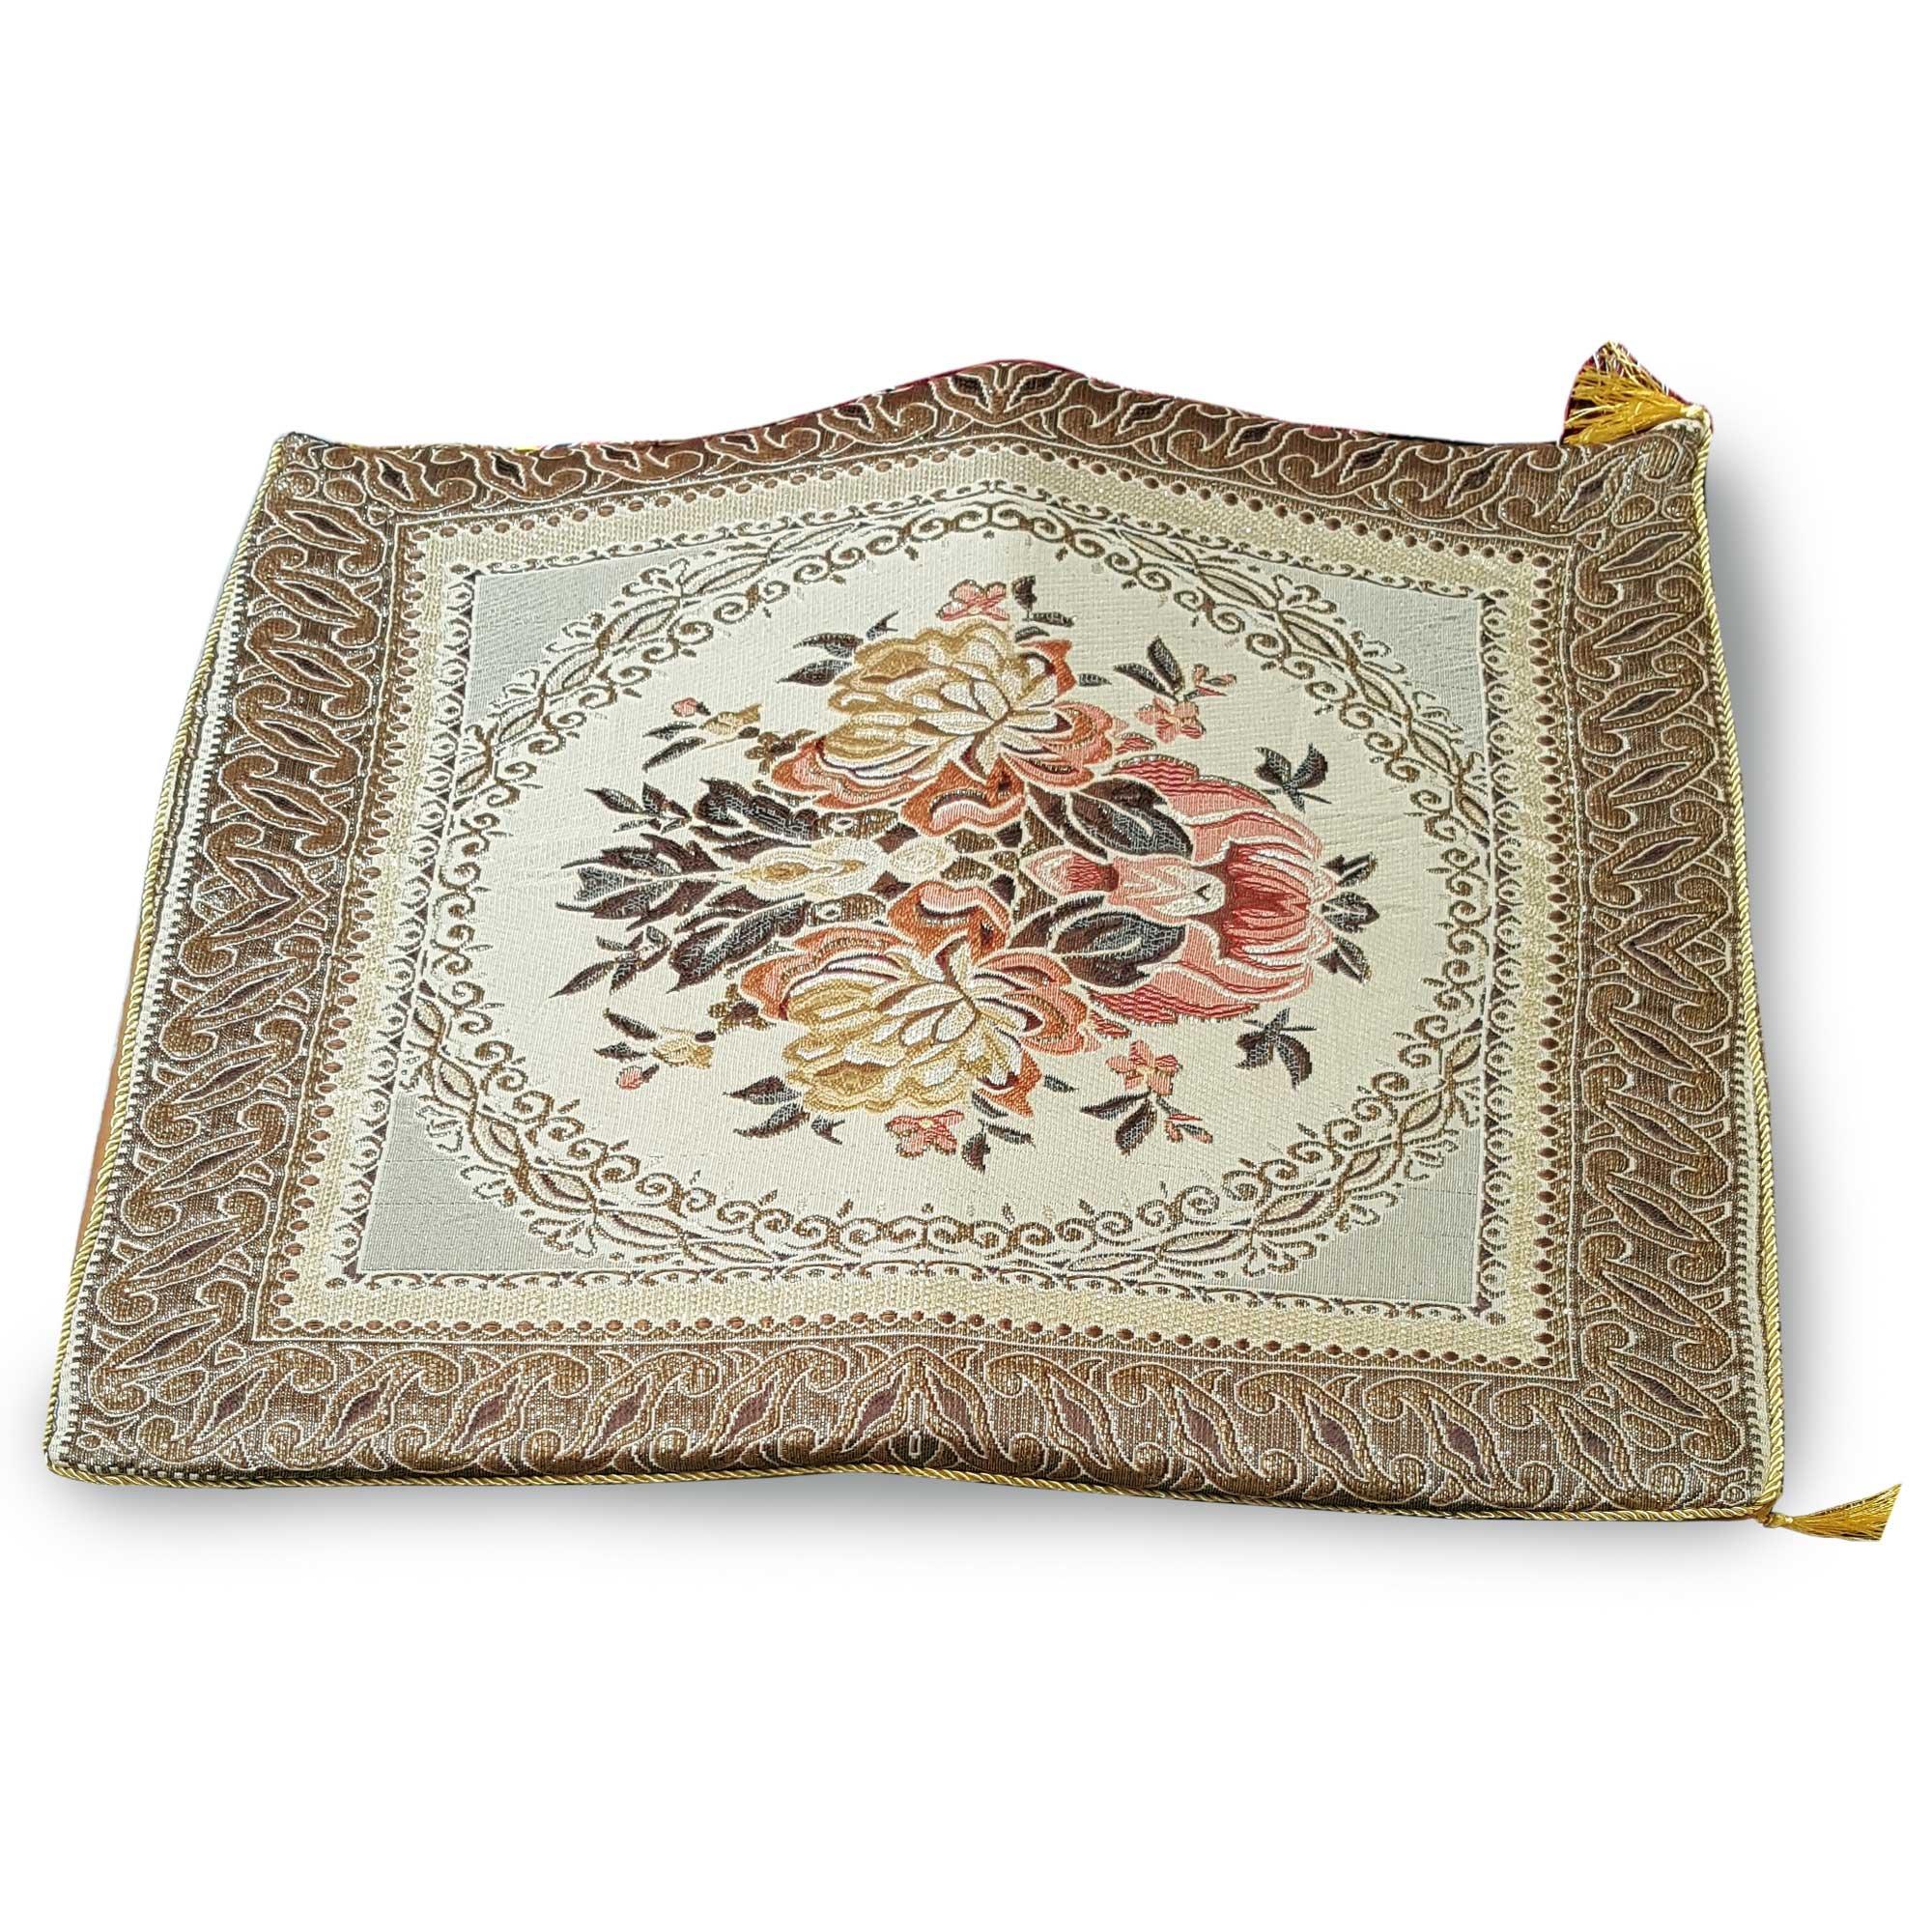 Thai asana Buddhist, meditation cushion, gold / brown size 24X24 inches